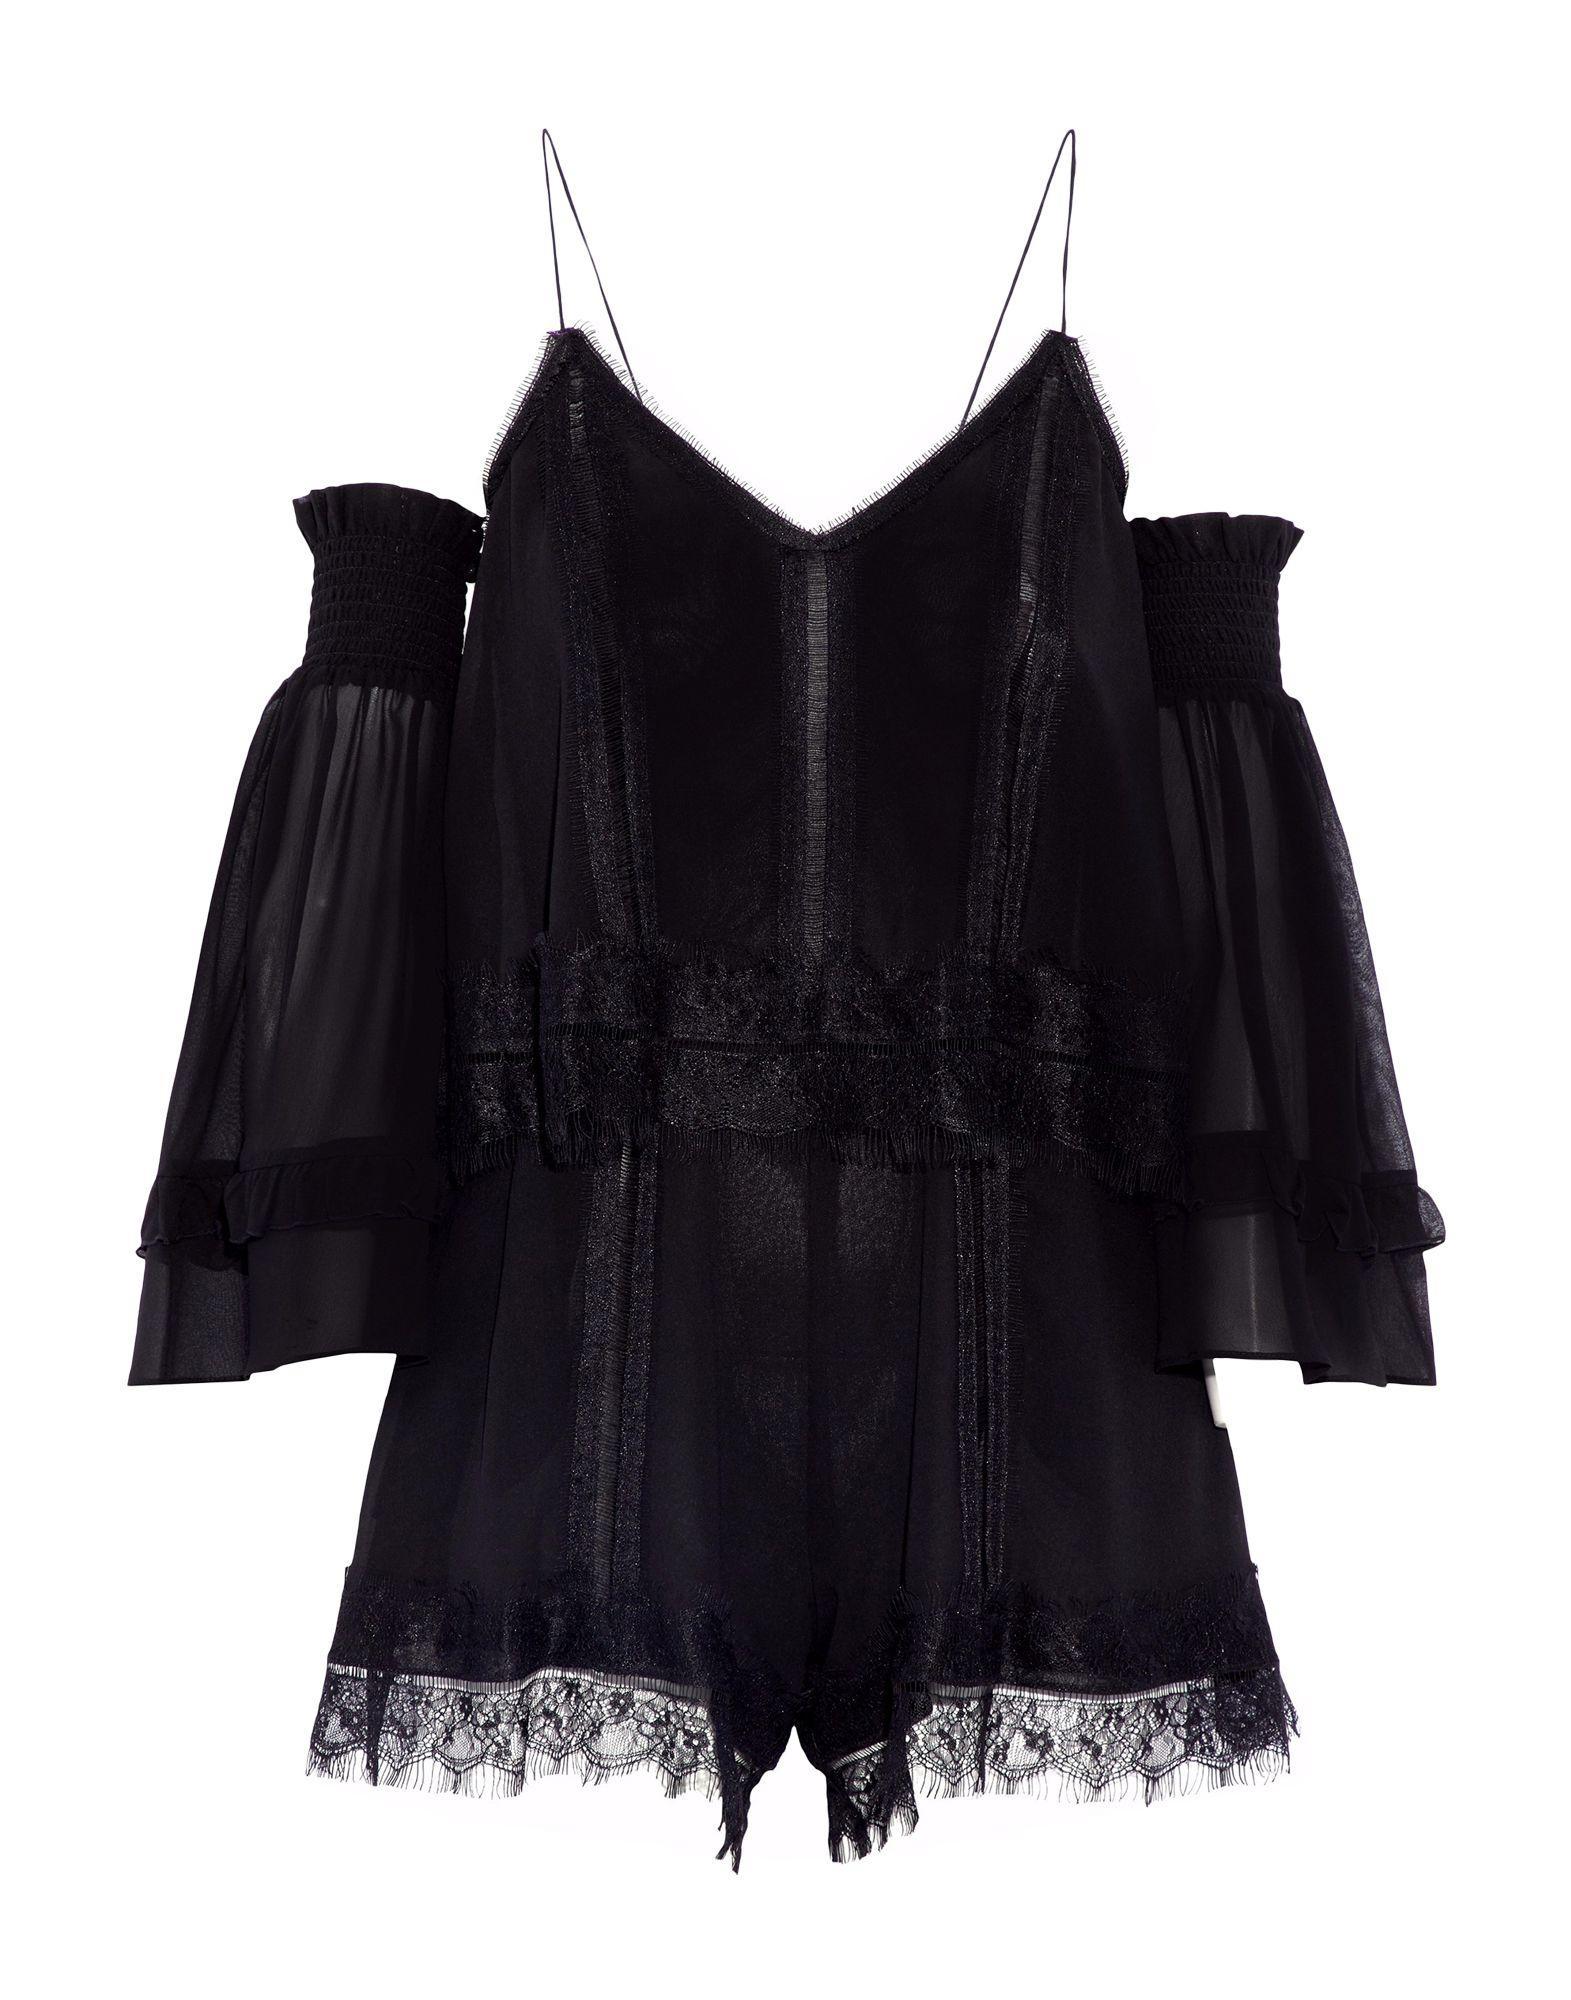 56391b7379a Lyst - Nicholas Jumpsuit in Black - Save 80%